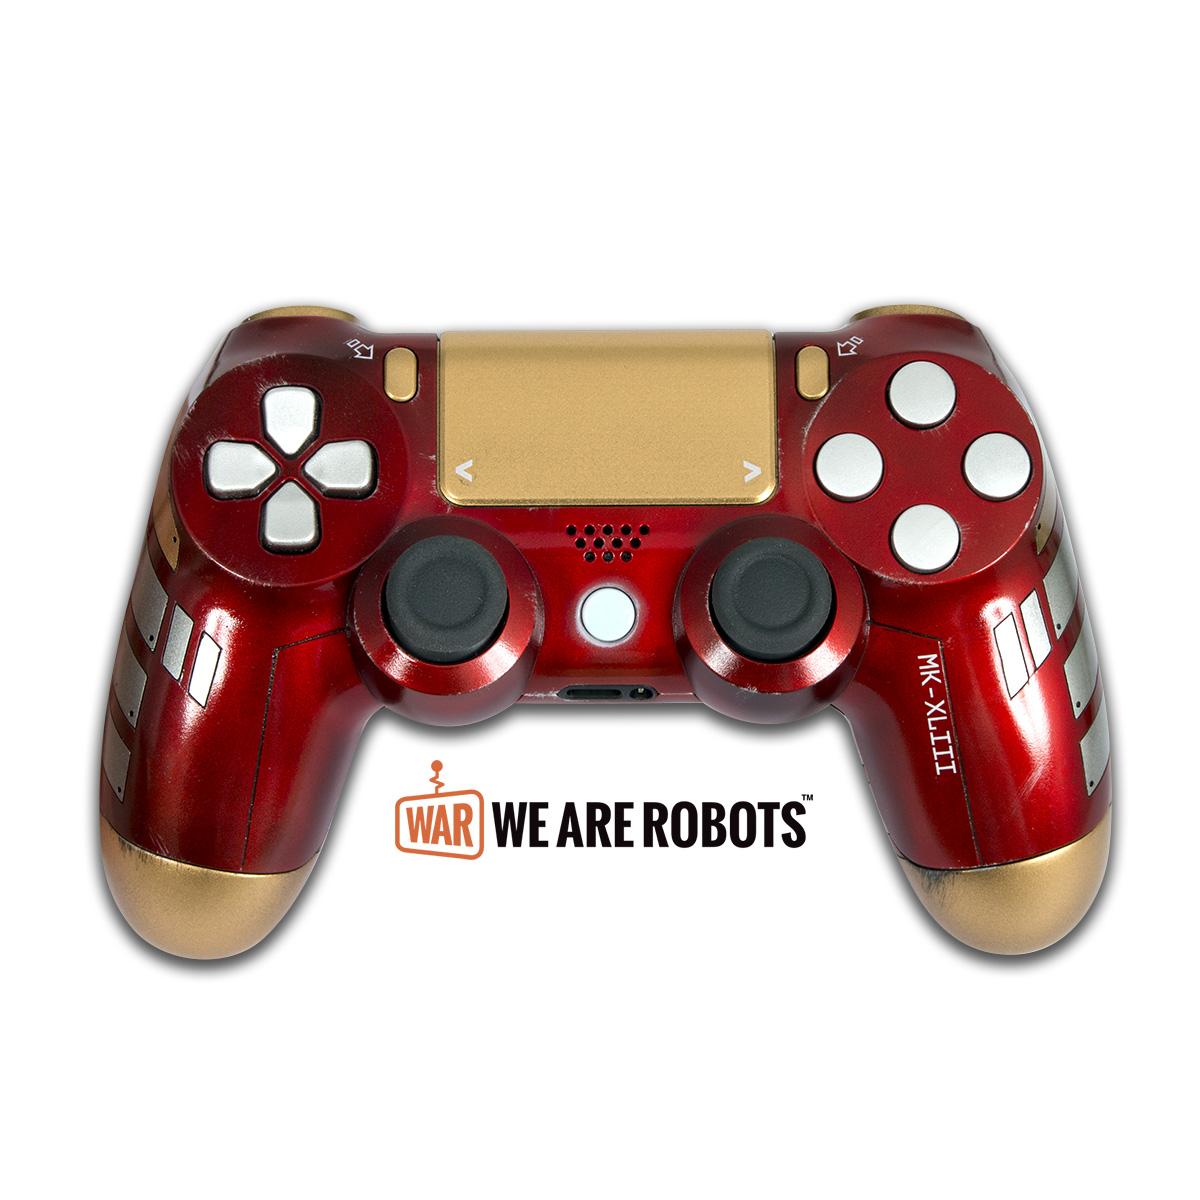 Ironman Custom Controller - We Are Robots